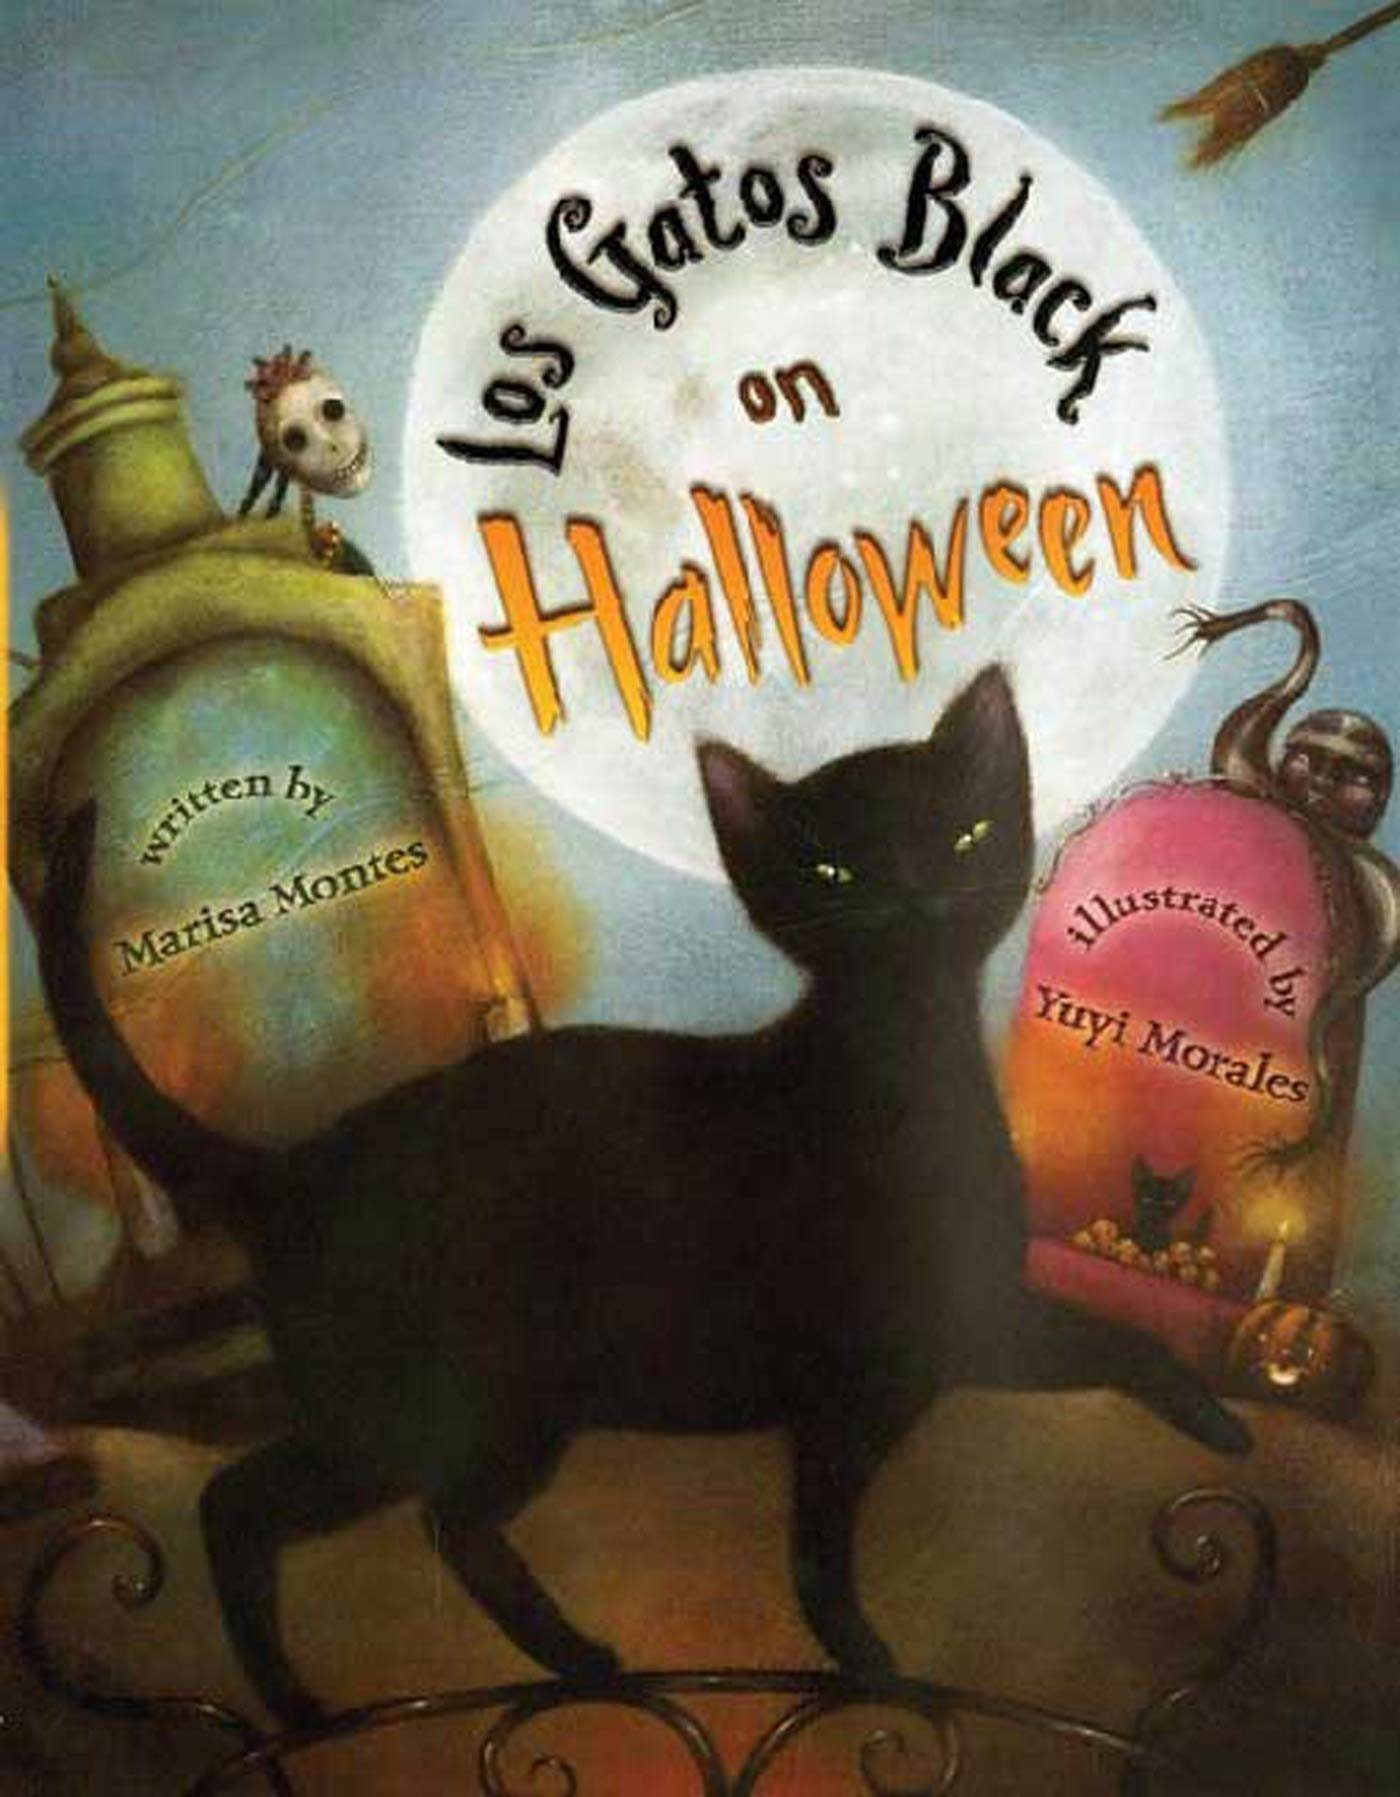 Los Gatos Black On Halloween: Marisa Montes, Yuyi Morales: 9781250079459:  Amazon: Books